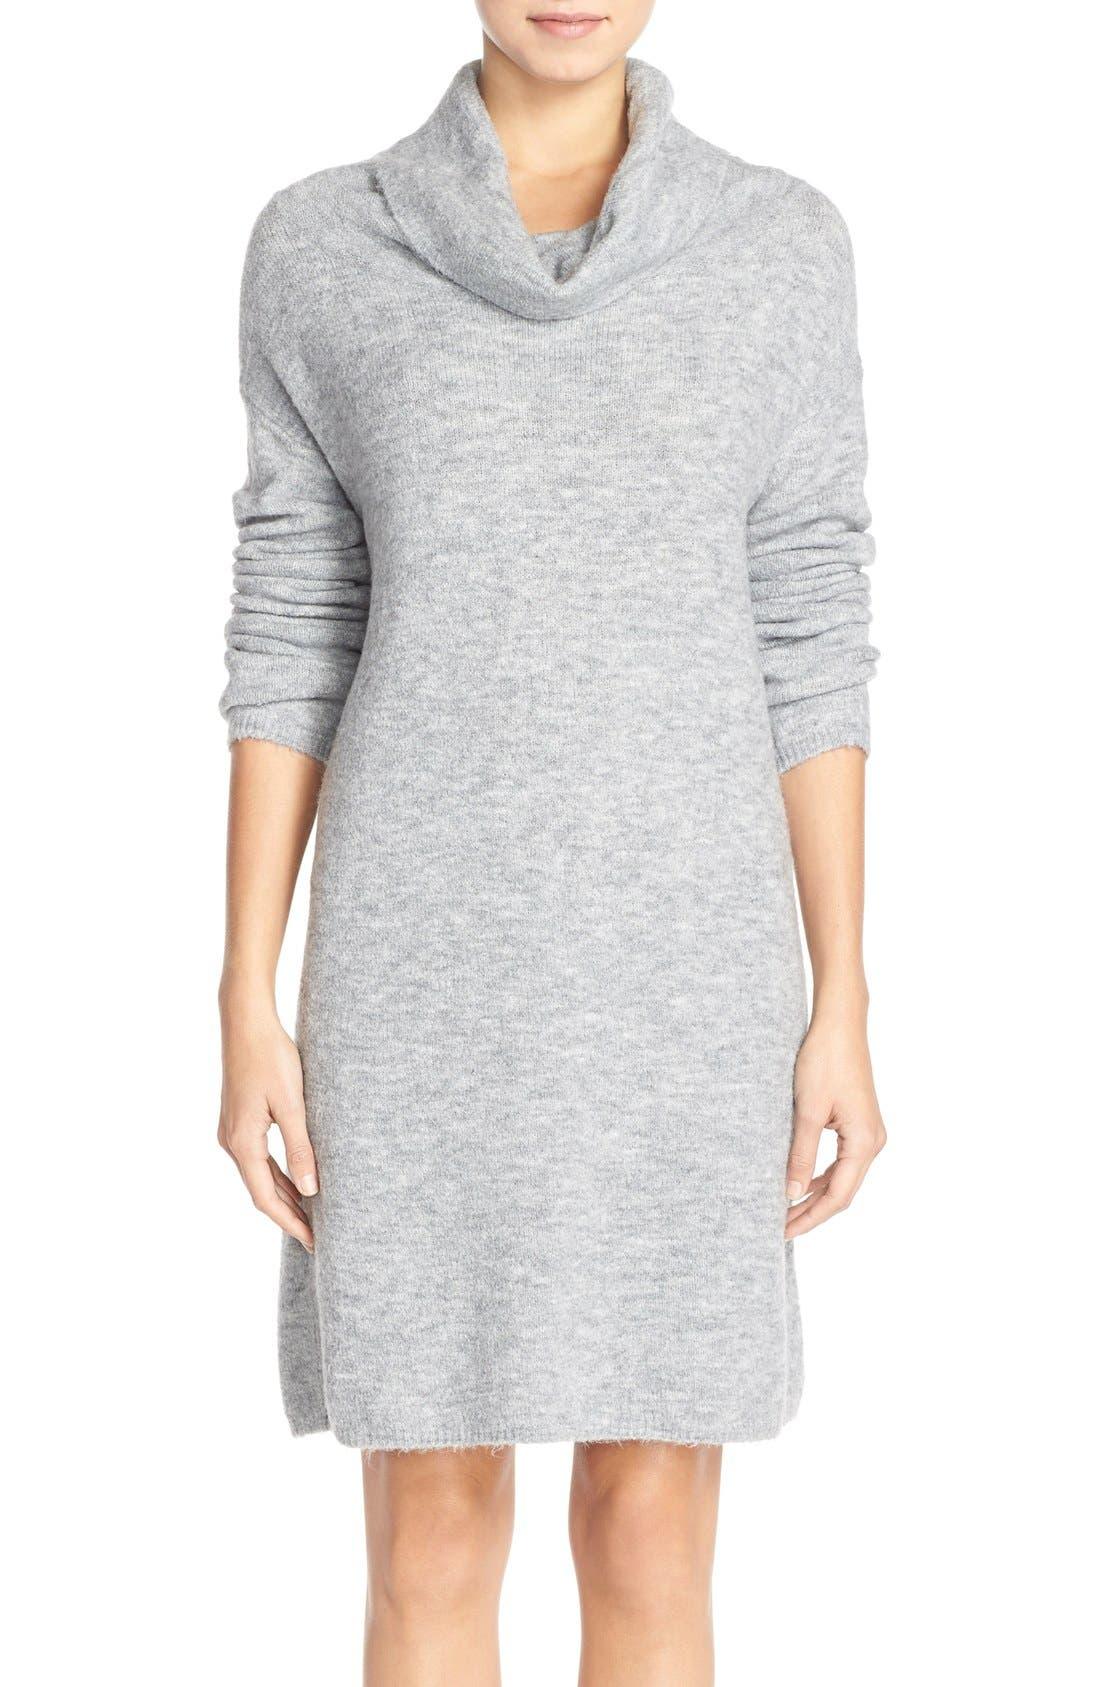 'Leighton' Turtleneck Sweater Dress,                             Main thumbnail 1, color,                             Grey